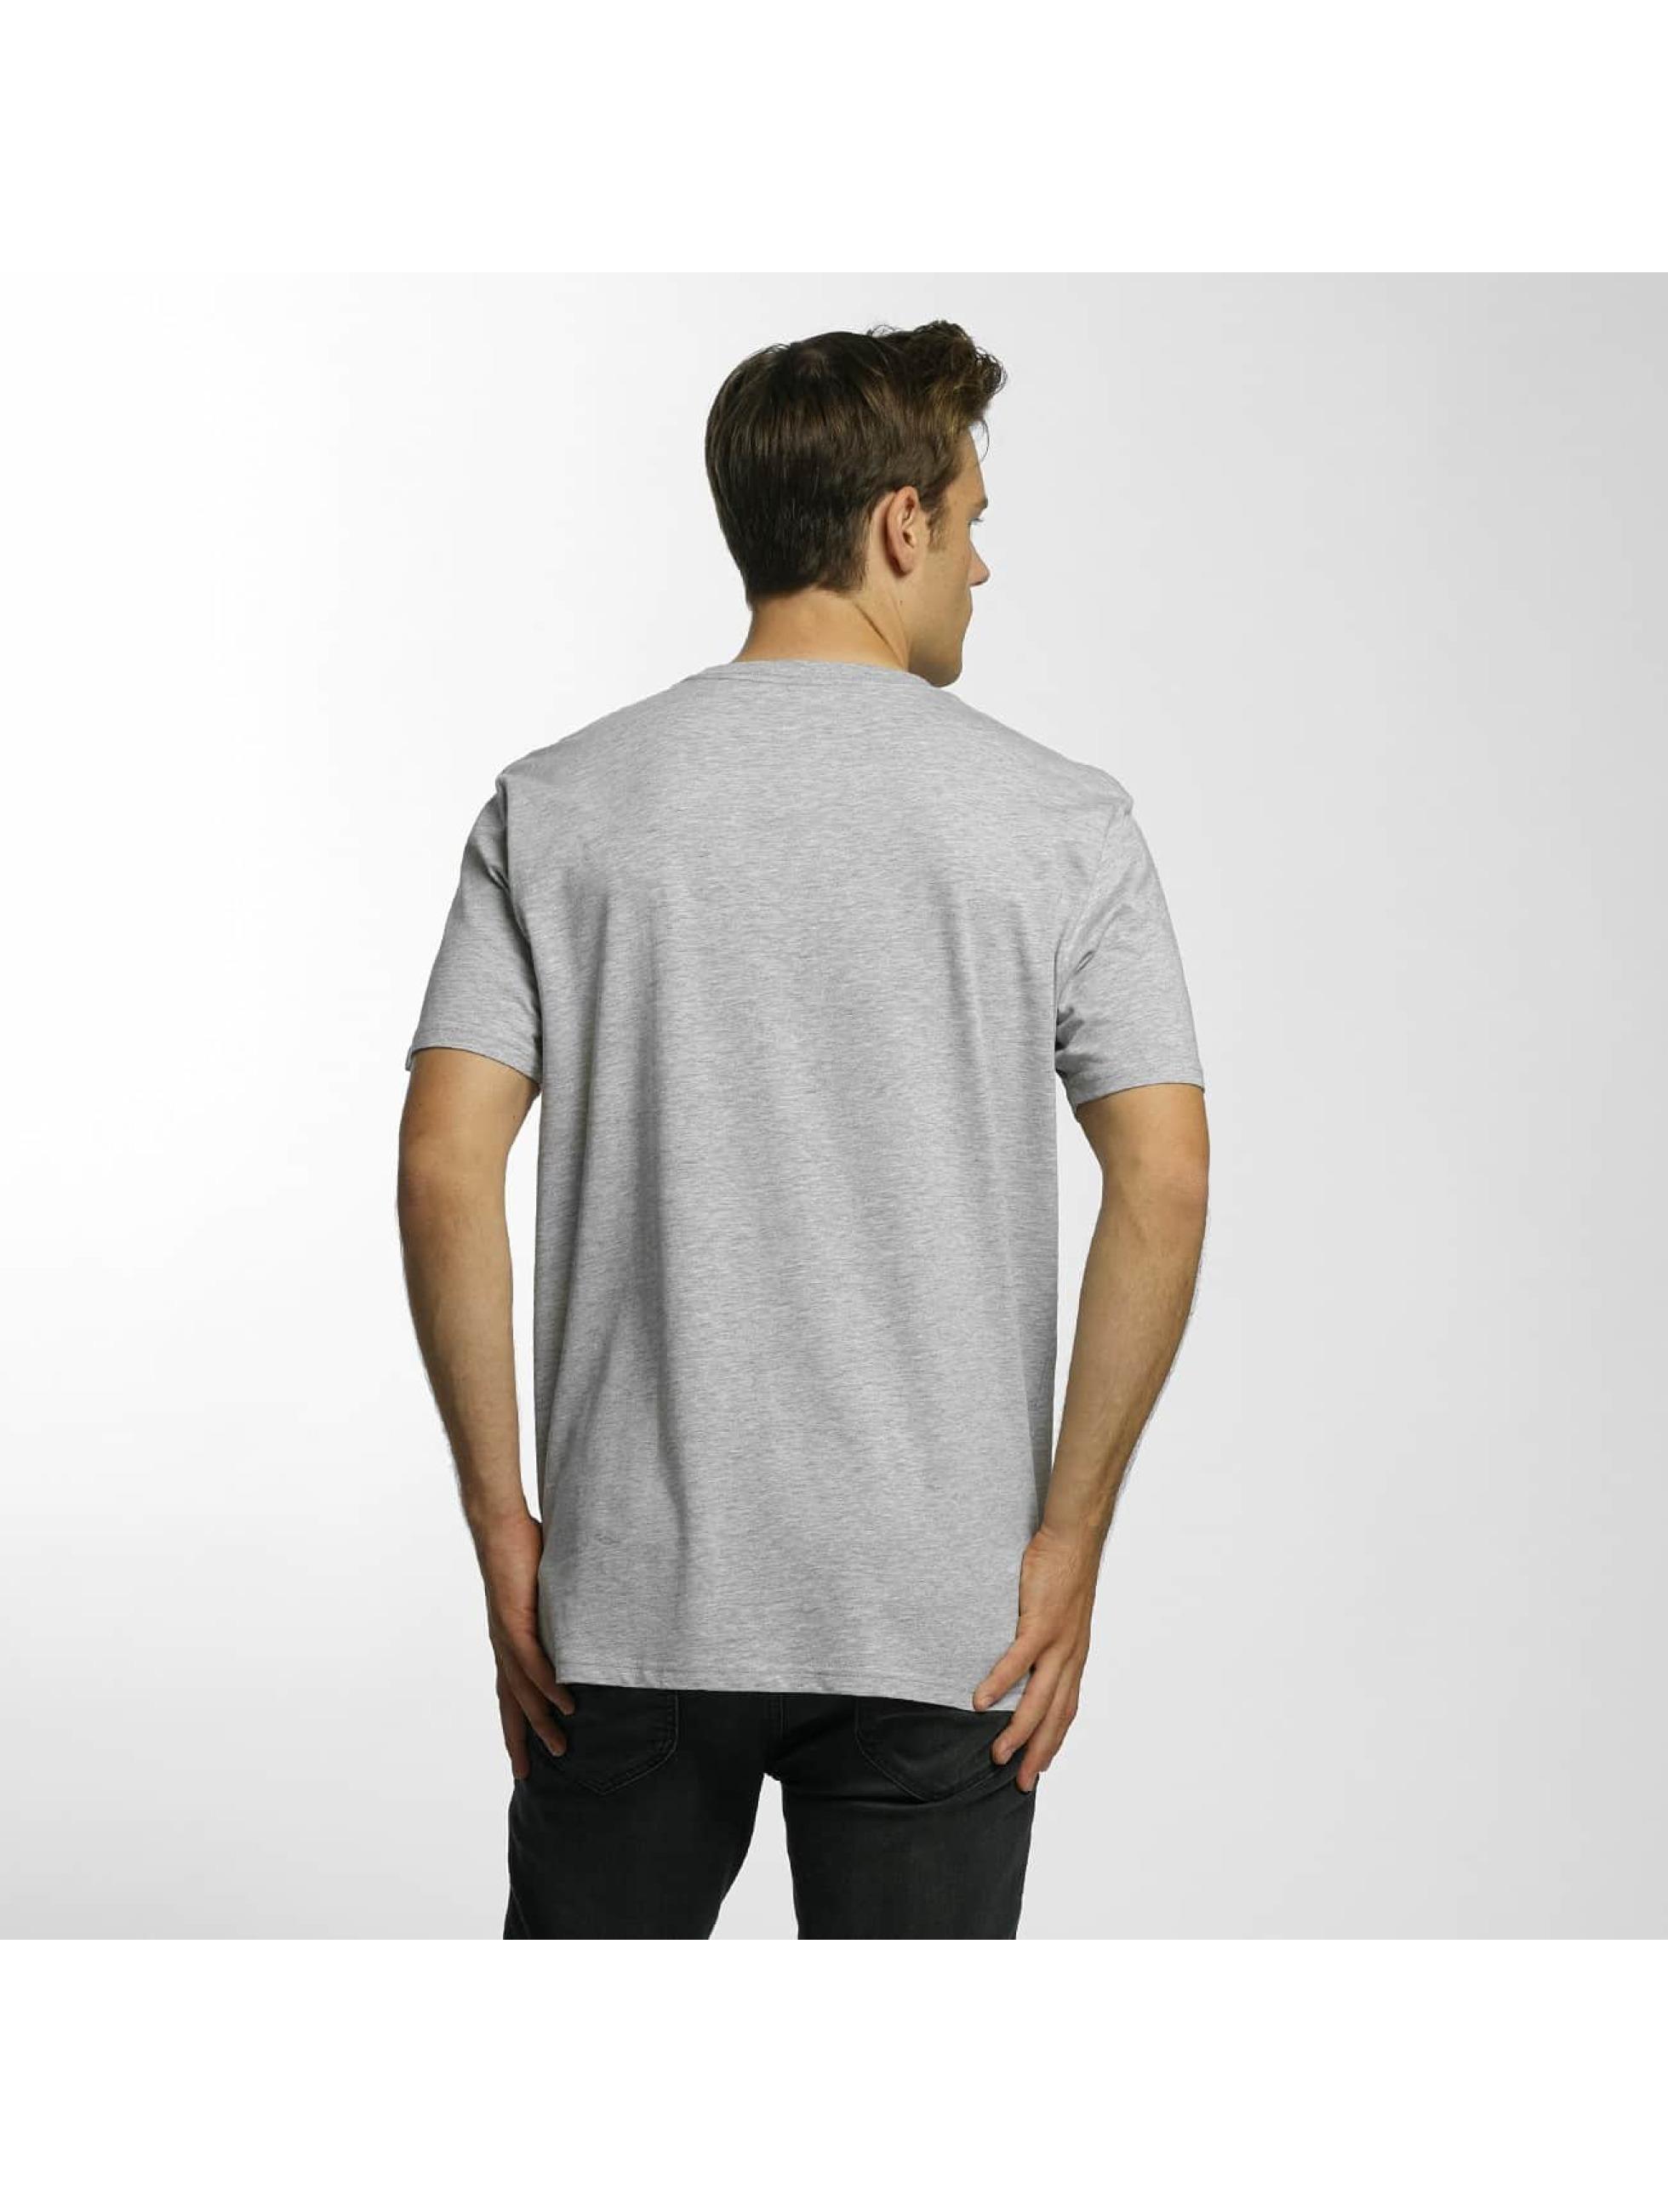 Volcom-Uomini-Maglieria-T-shirt-Budy-Basic